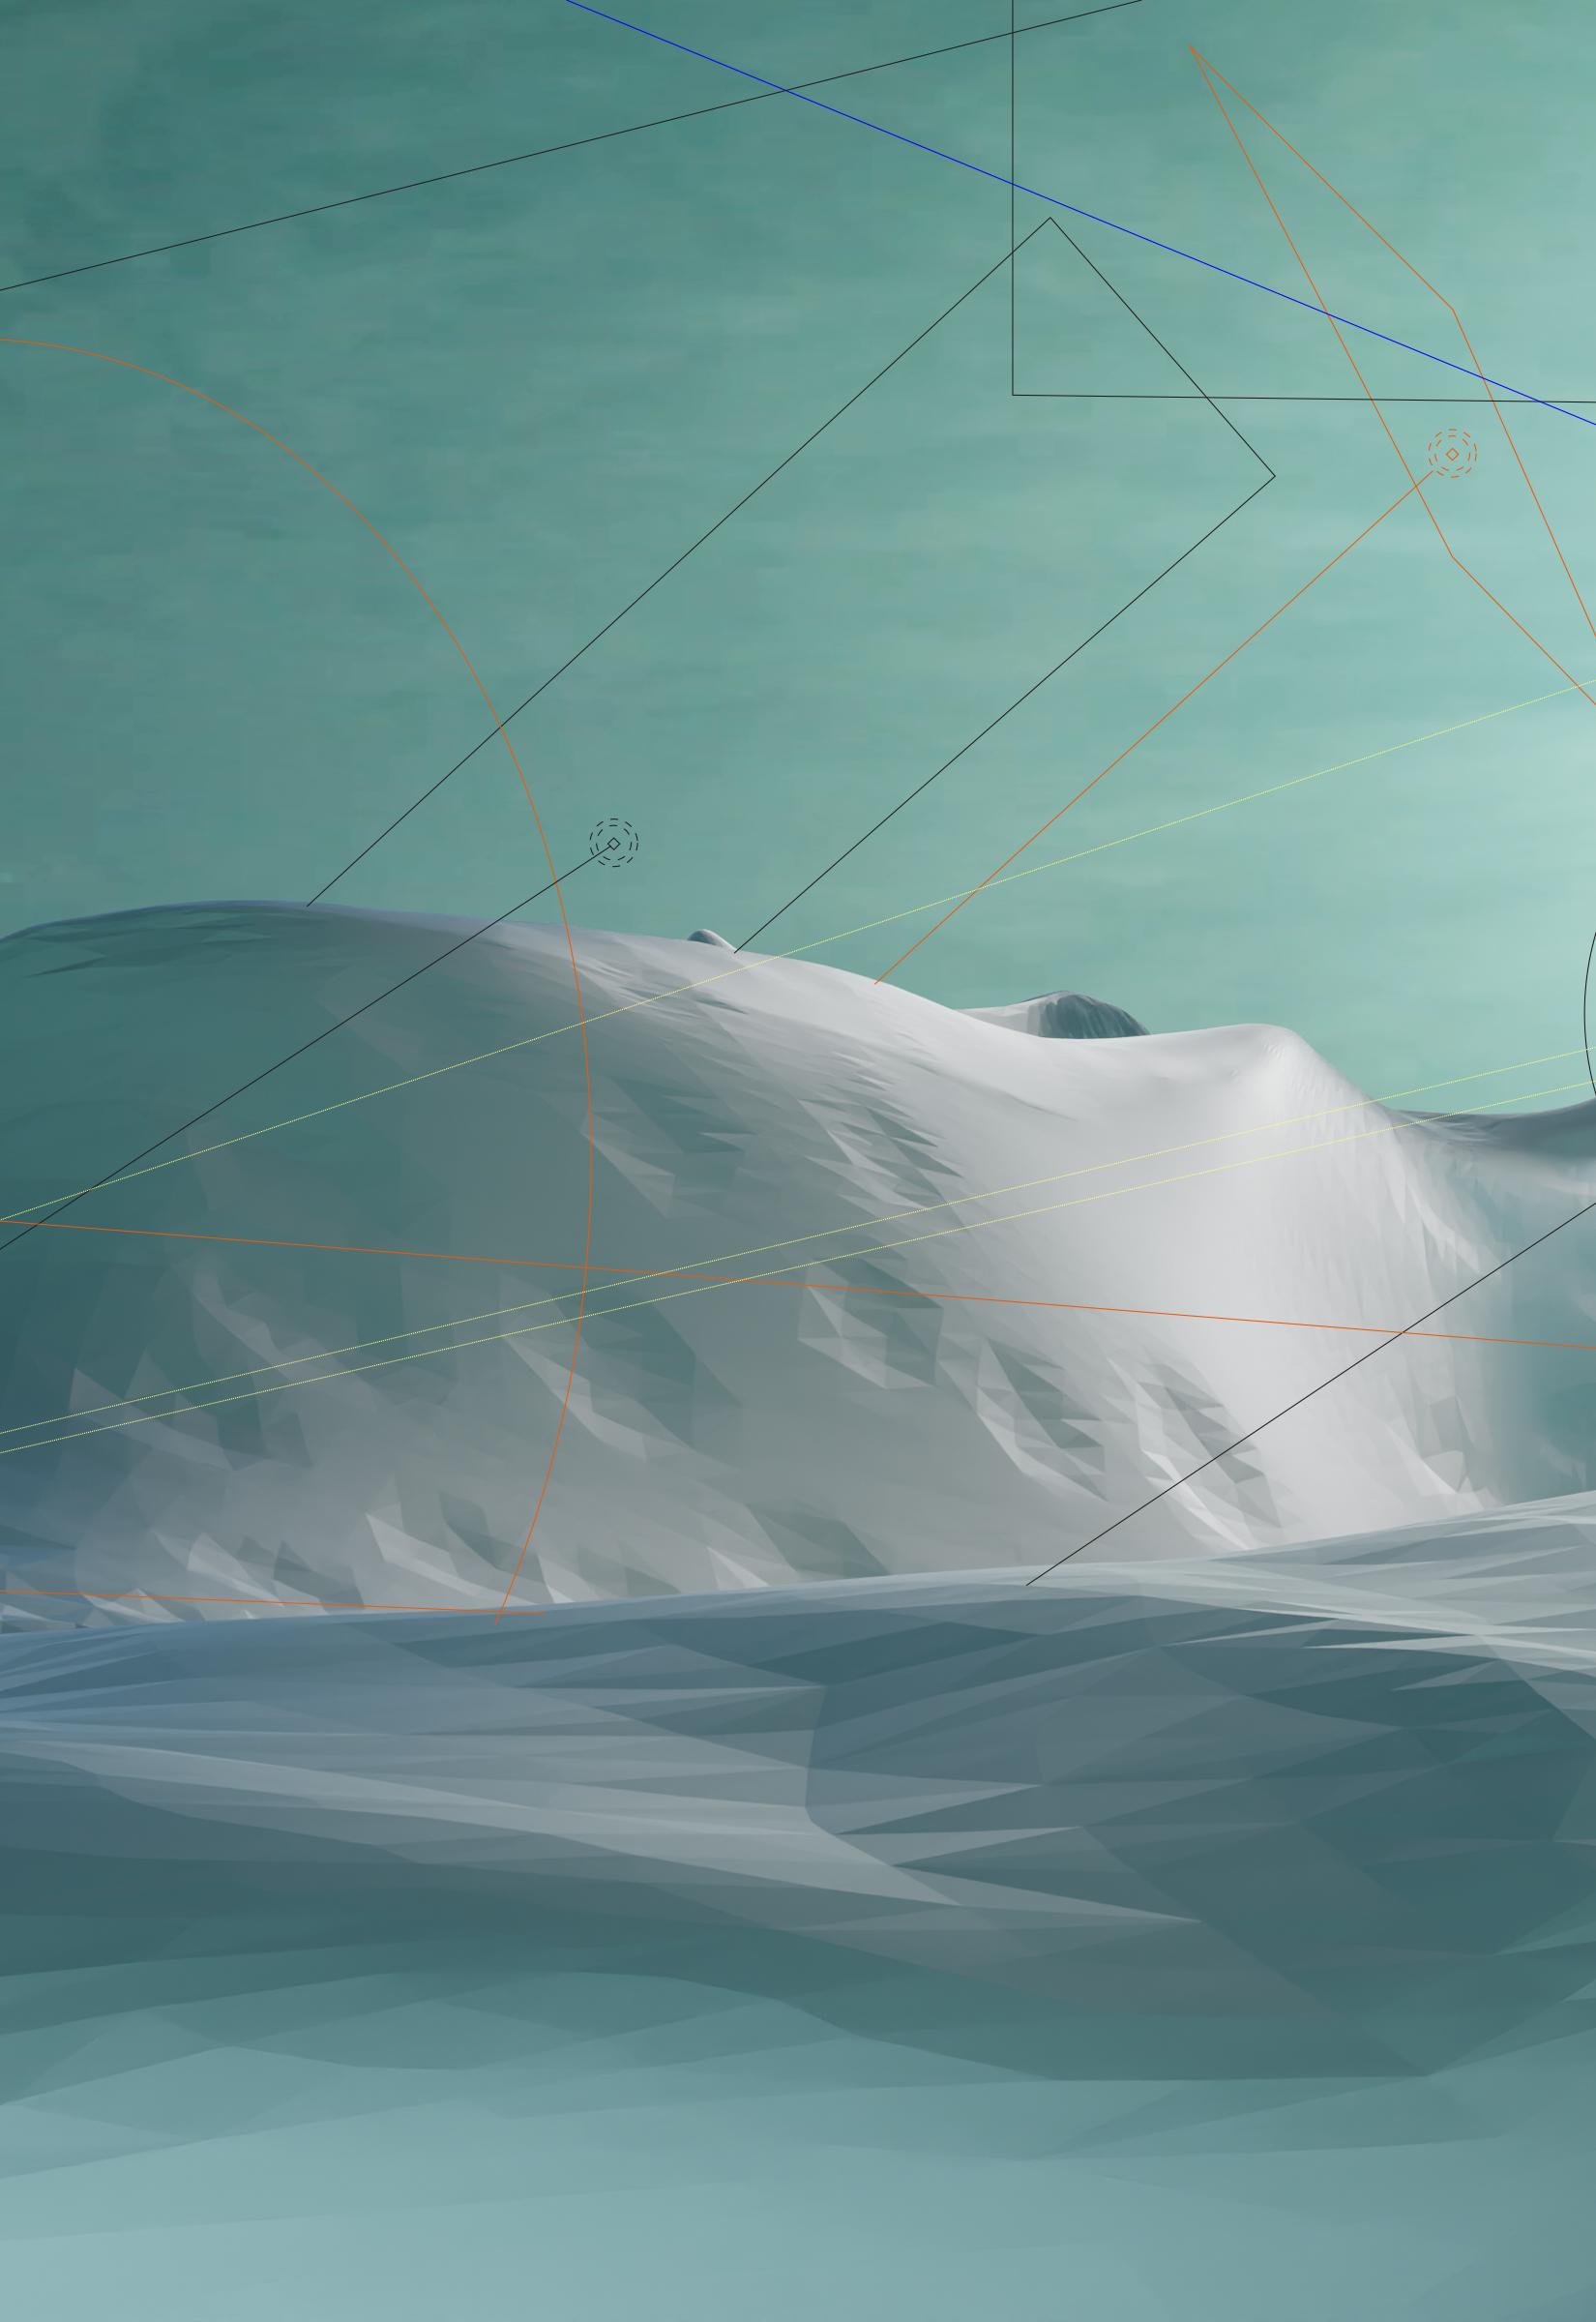 nichola feldman-kiss, Siren III | Panorama 180, (detail), 2021. Courtesy of the artist